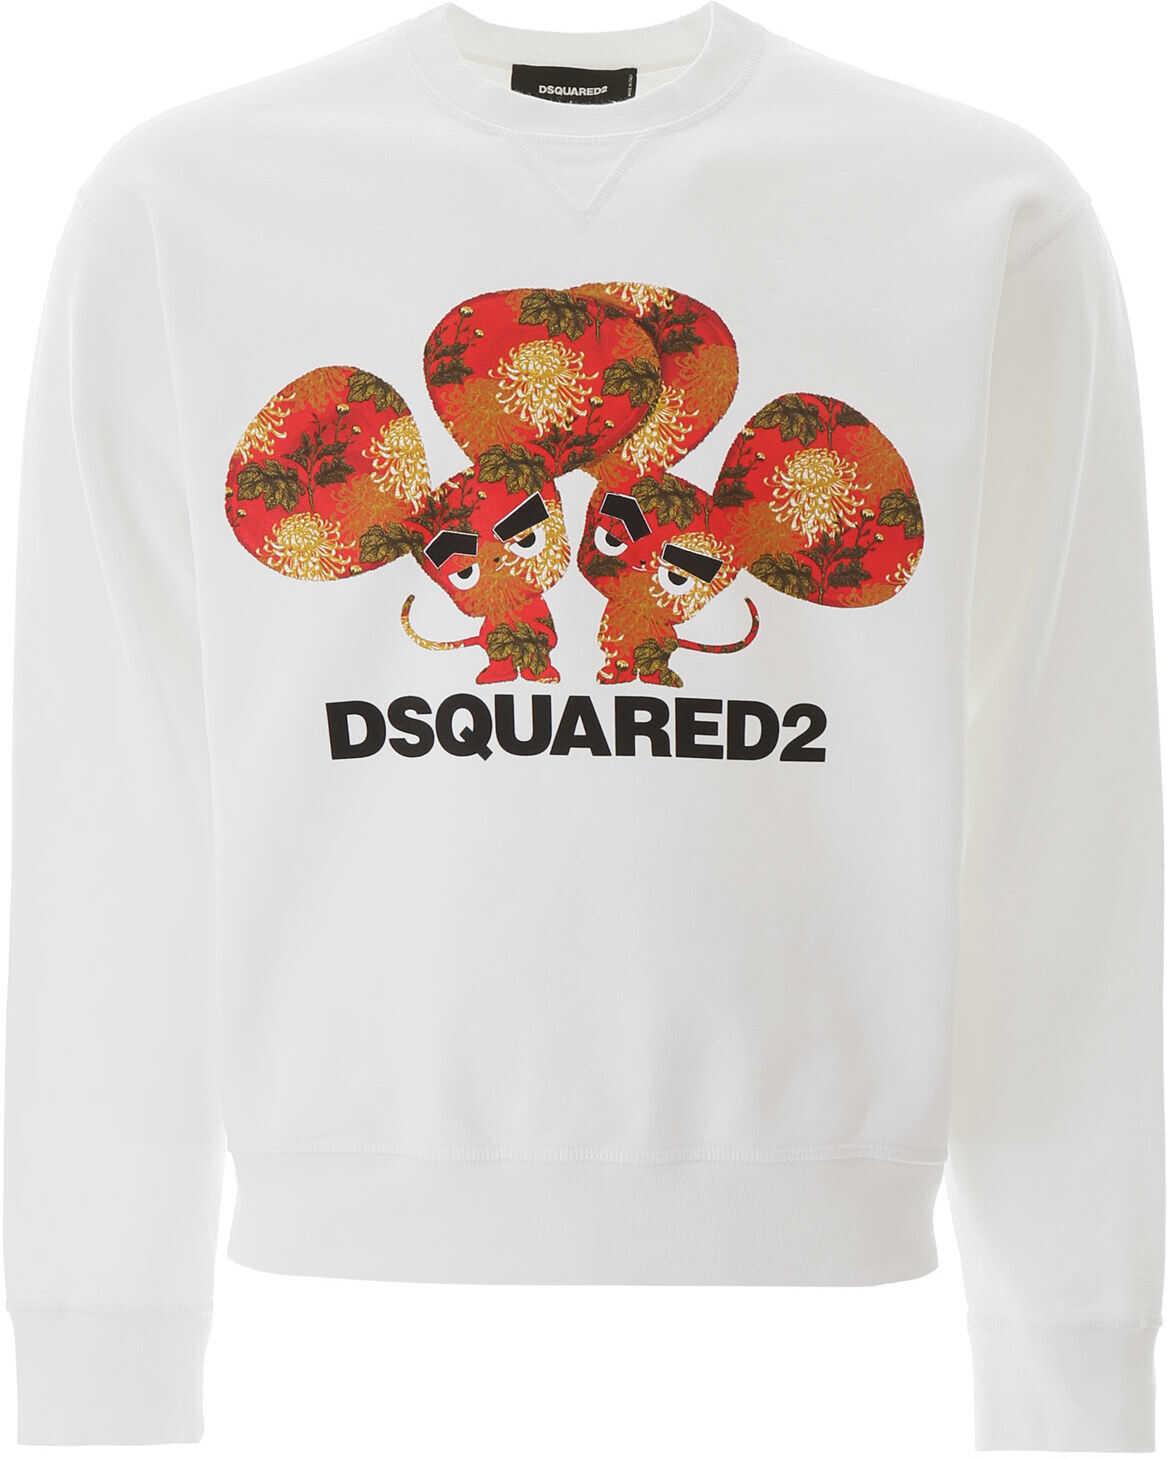 DSQUARED2 Logo Print Sweatshirt WHITE imagine